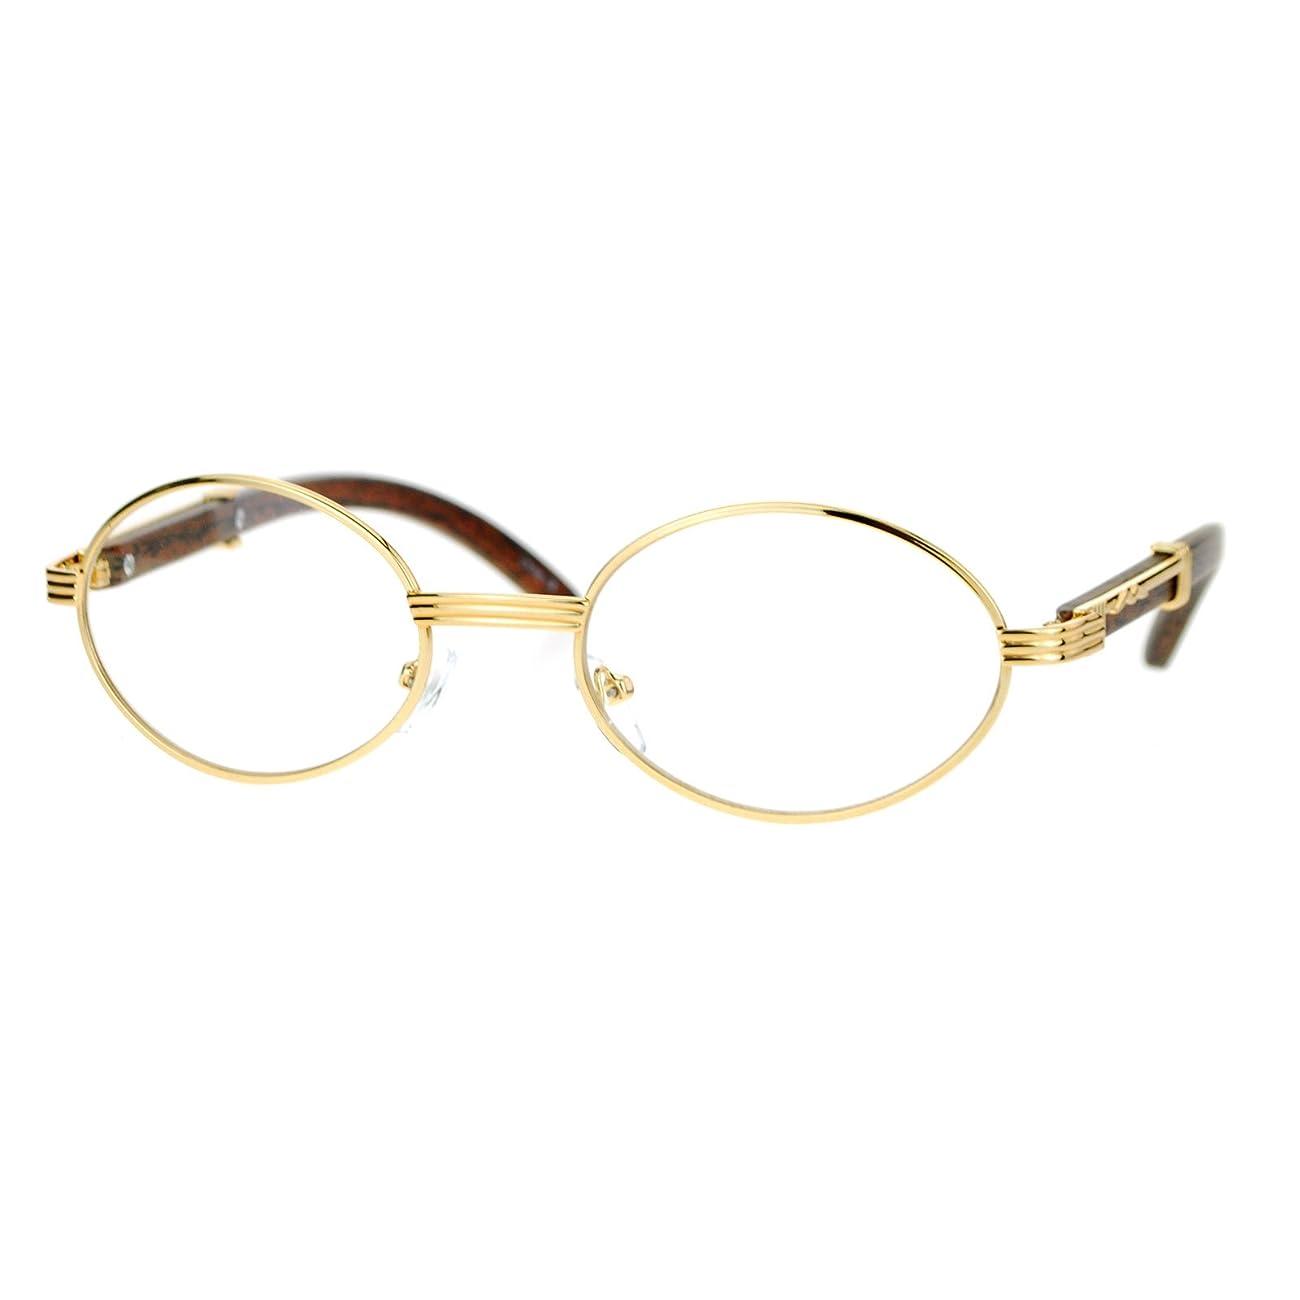 SA106 Art Nouveau Vintage Style Oval Metal Frame Eye Glasses 1